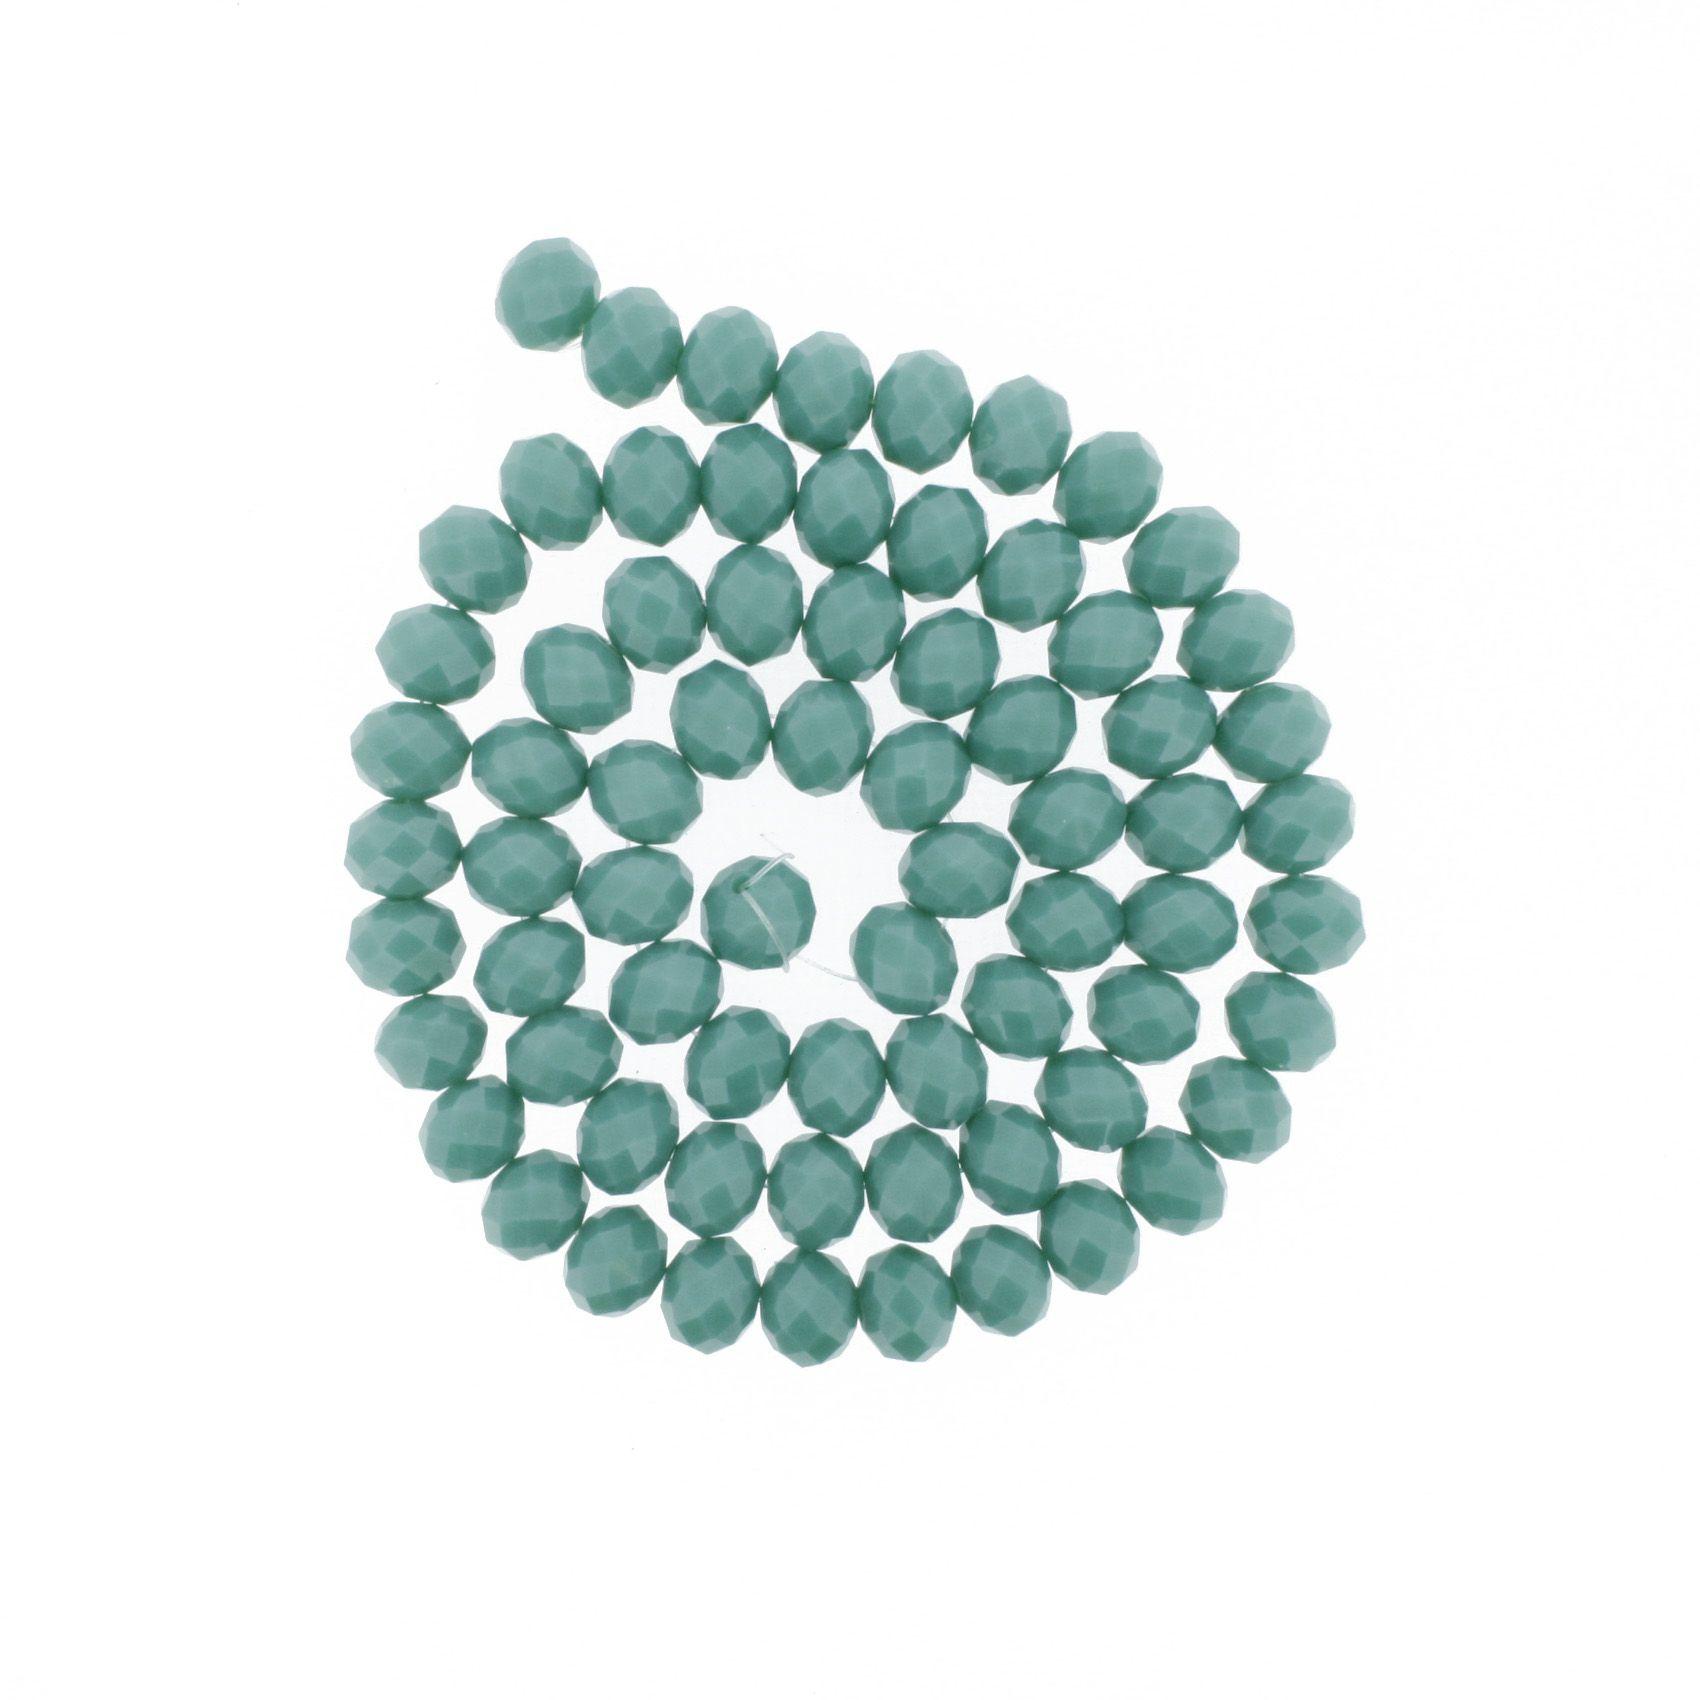 Fio de Cristal - Flat® - Verde Turquesa - 10mm  - Stéphanie Bijoux® - Peças para Bijuterias e Artesanato